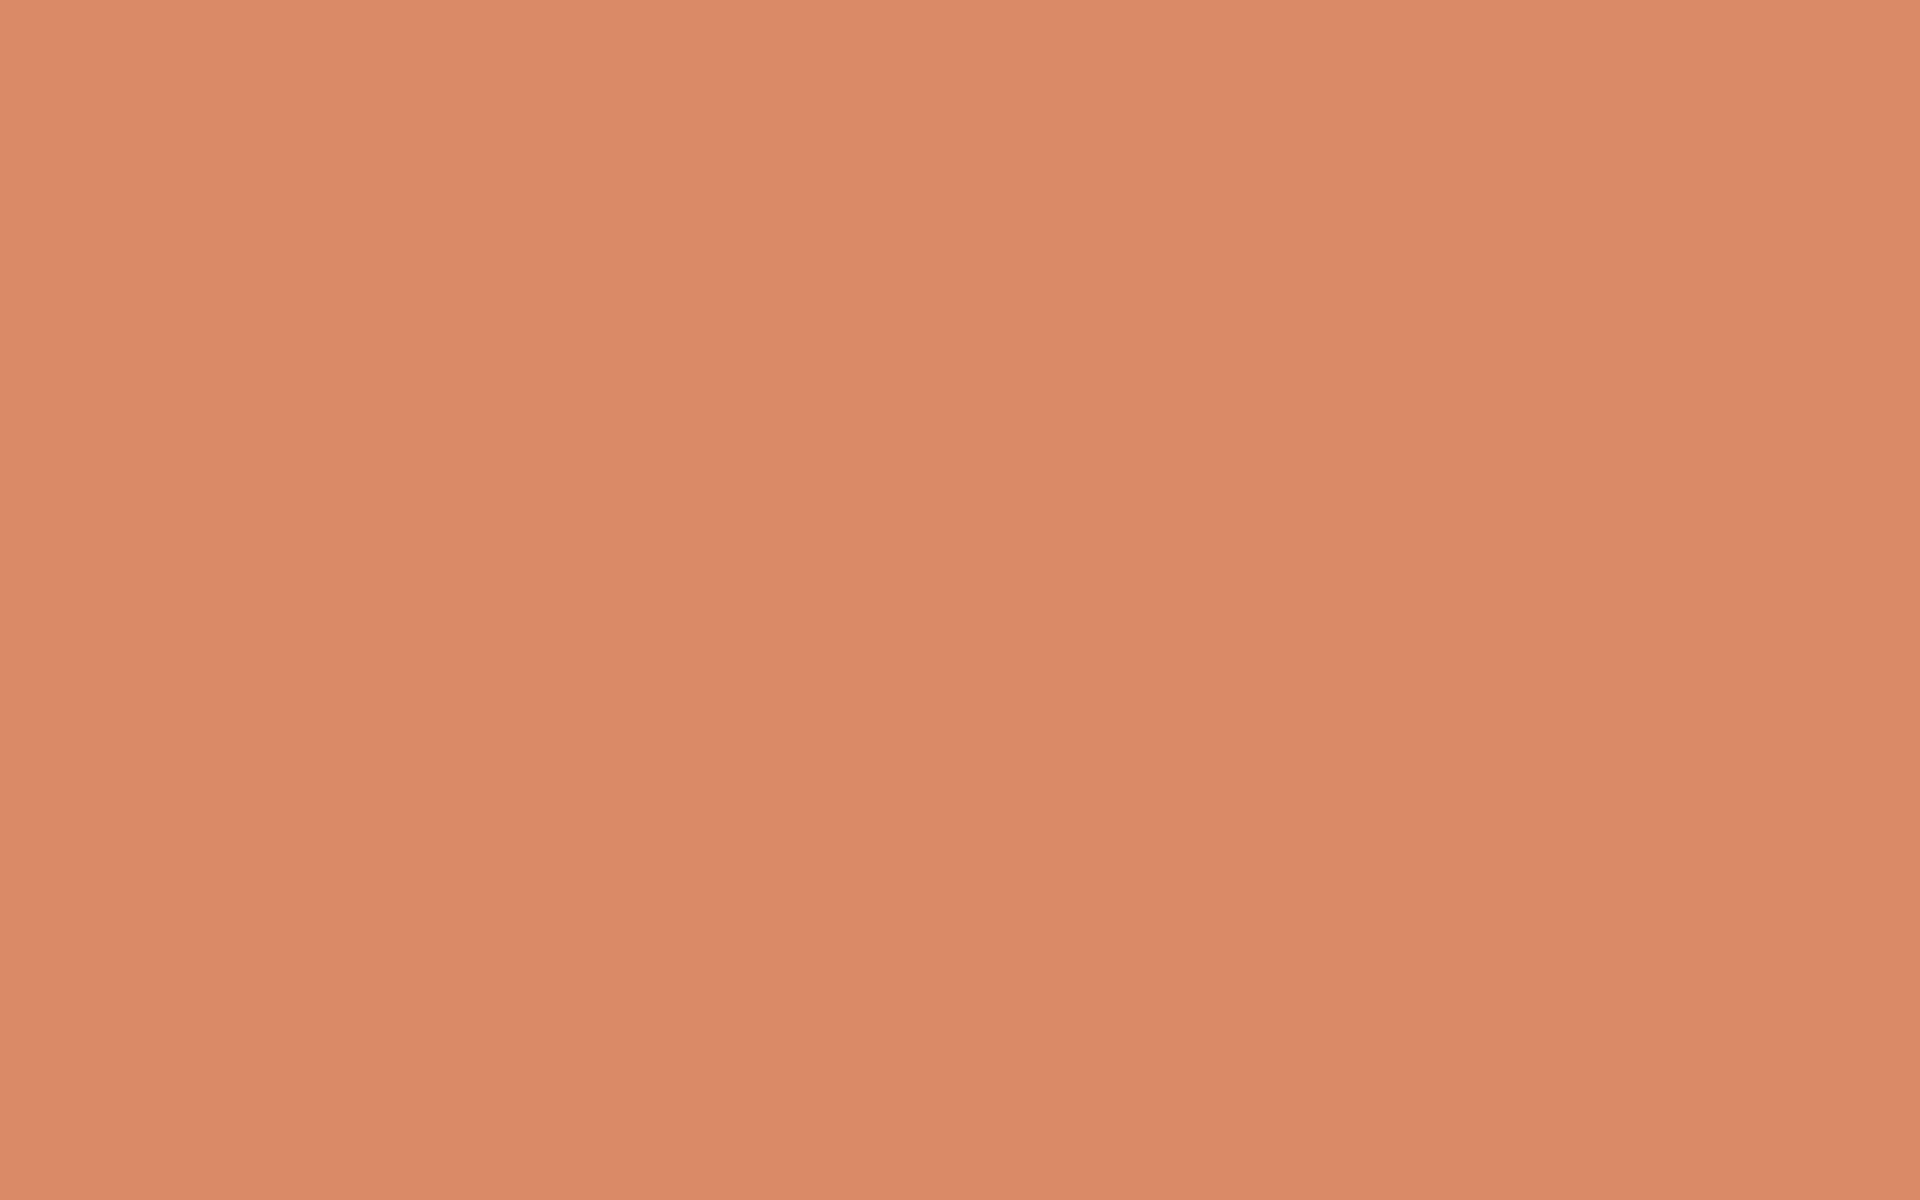 1920x1200 Copper Crayola Solid Color Background